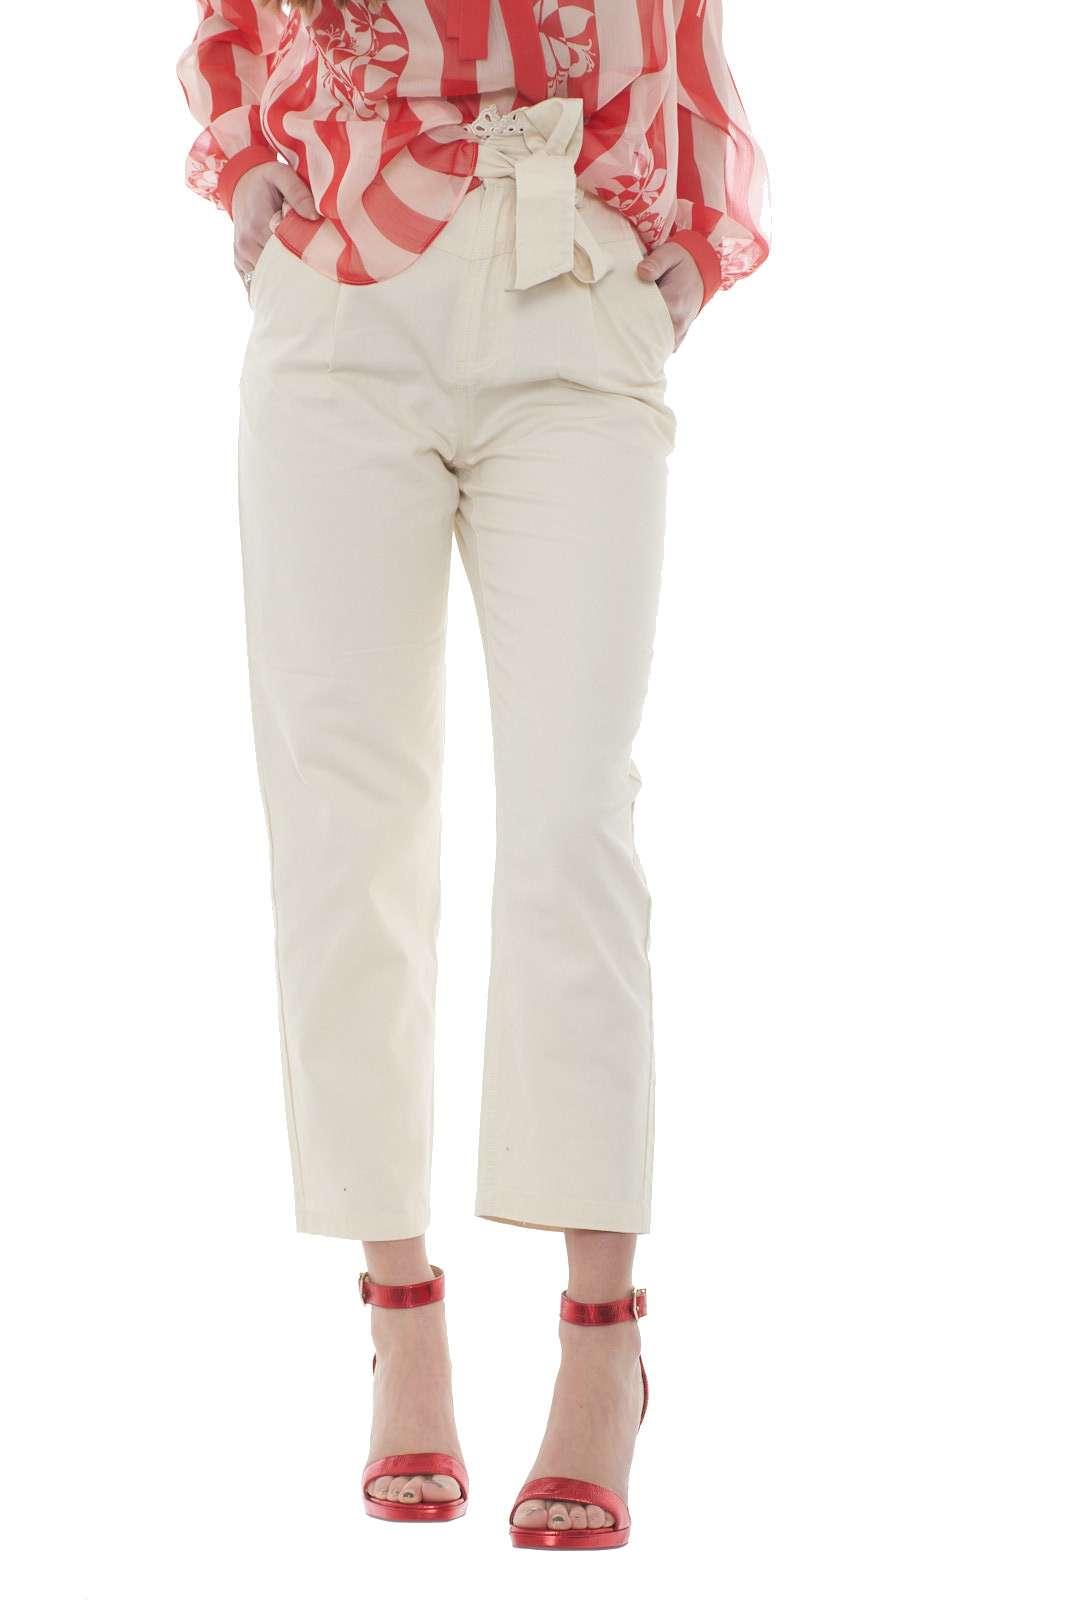 https://www.parmax.com/media/catalog/product/a/i/PE-outlet_parmax-pantaloni-donna-TwinSet-201TP2015-.jpg